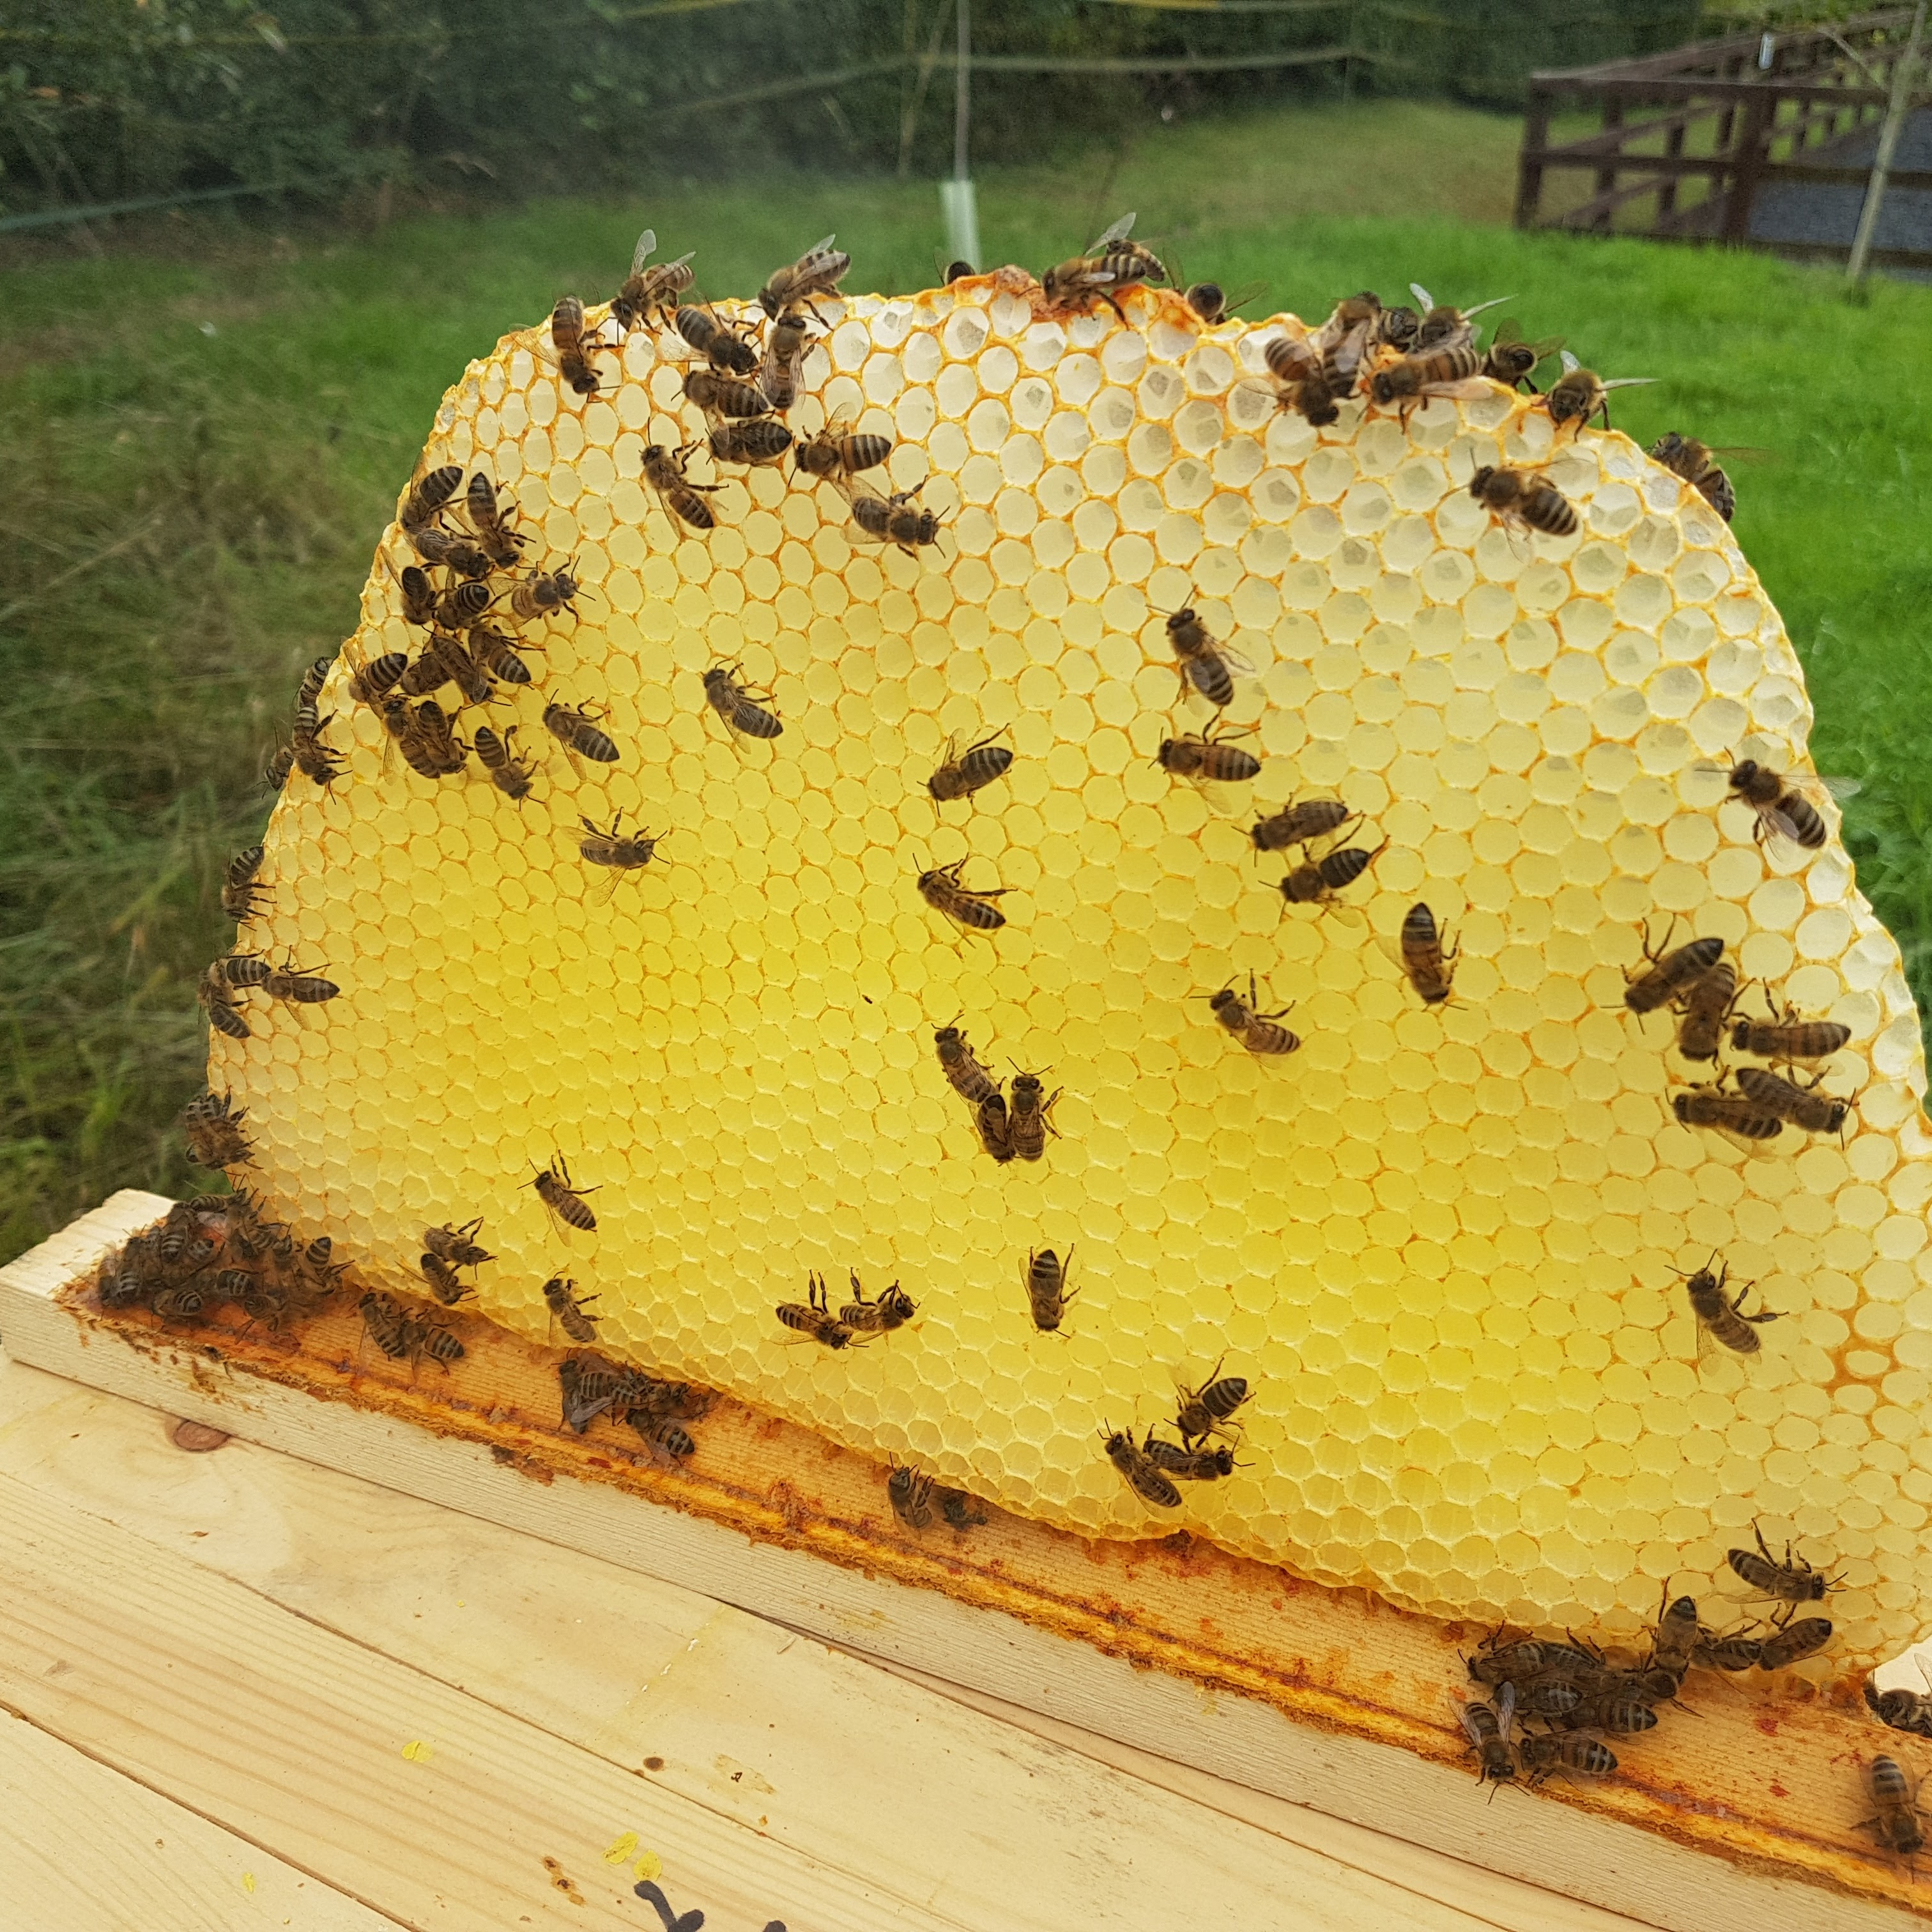 Top Bars | Top Bar Beehives | Beehives For Sale | Natural ...